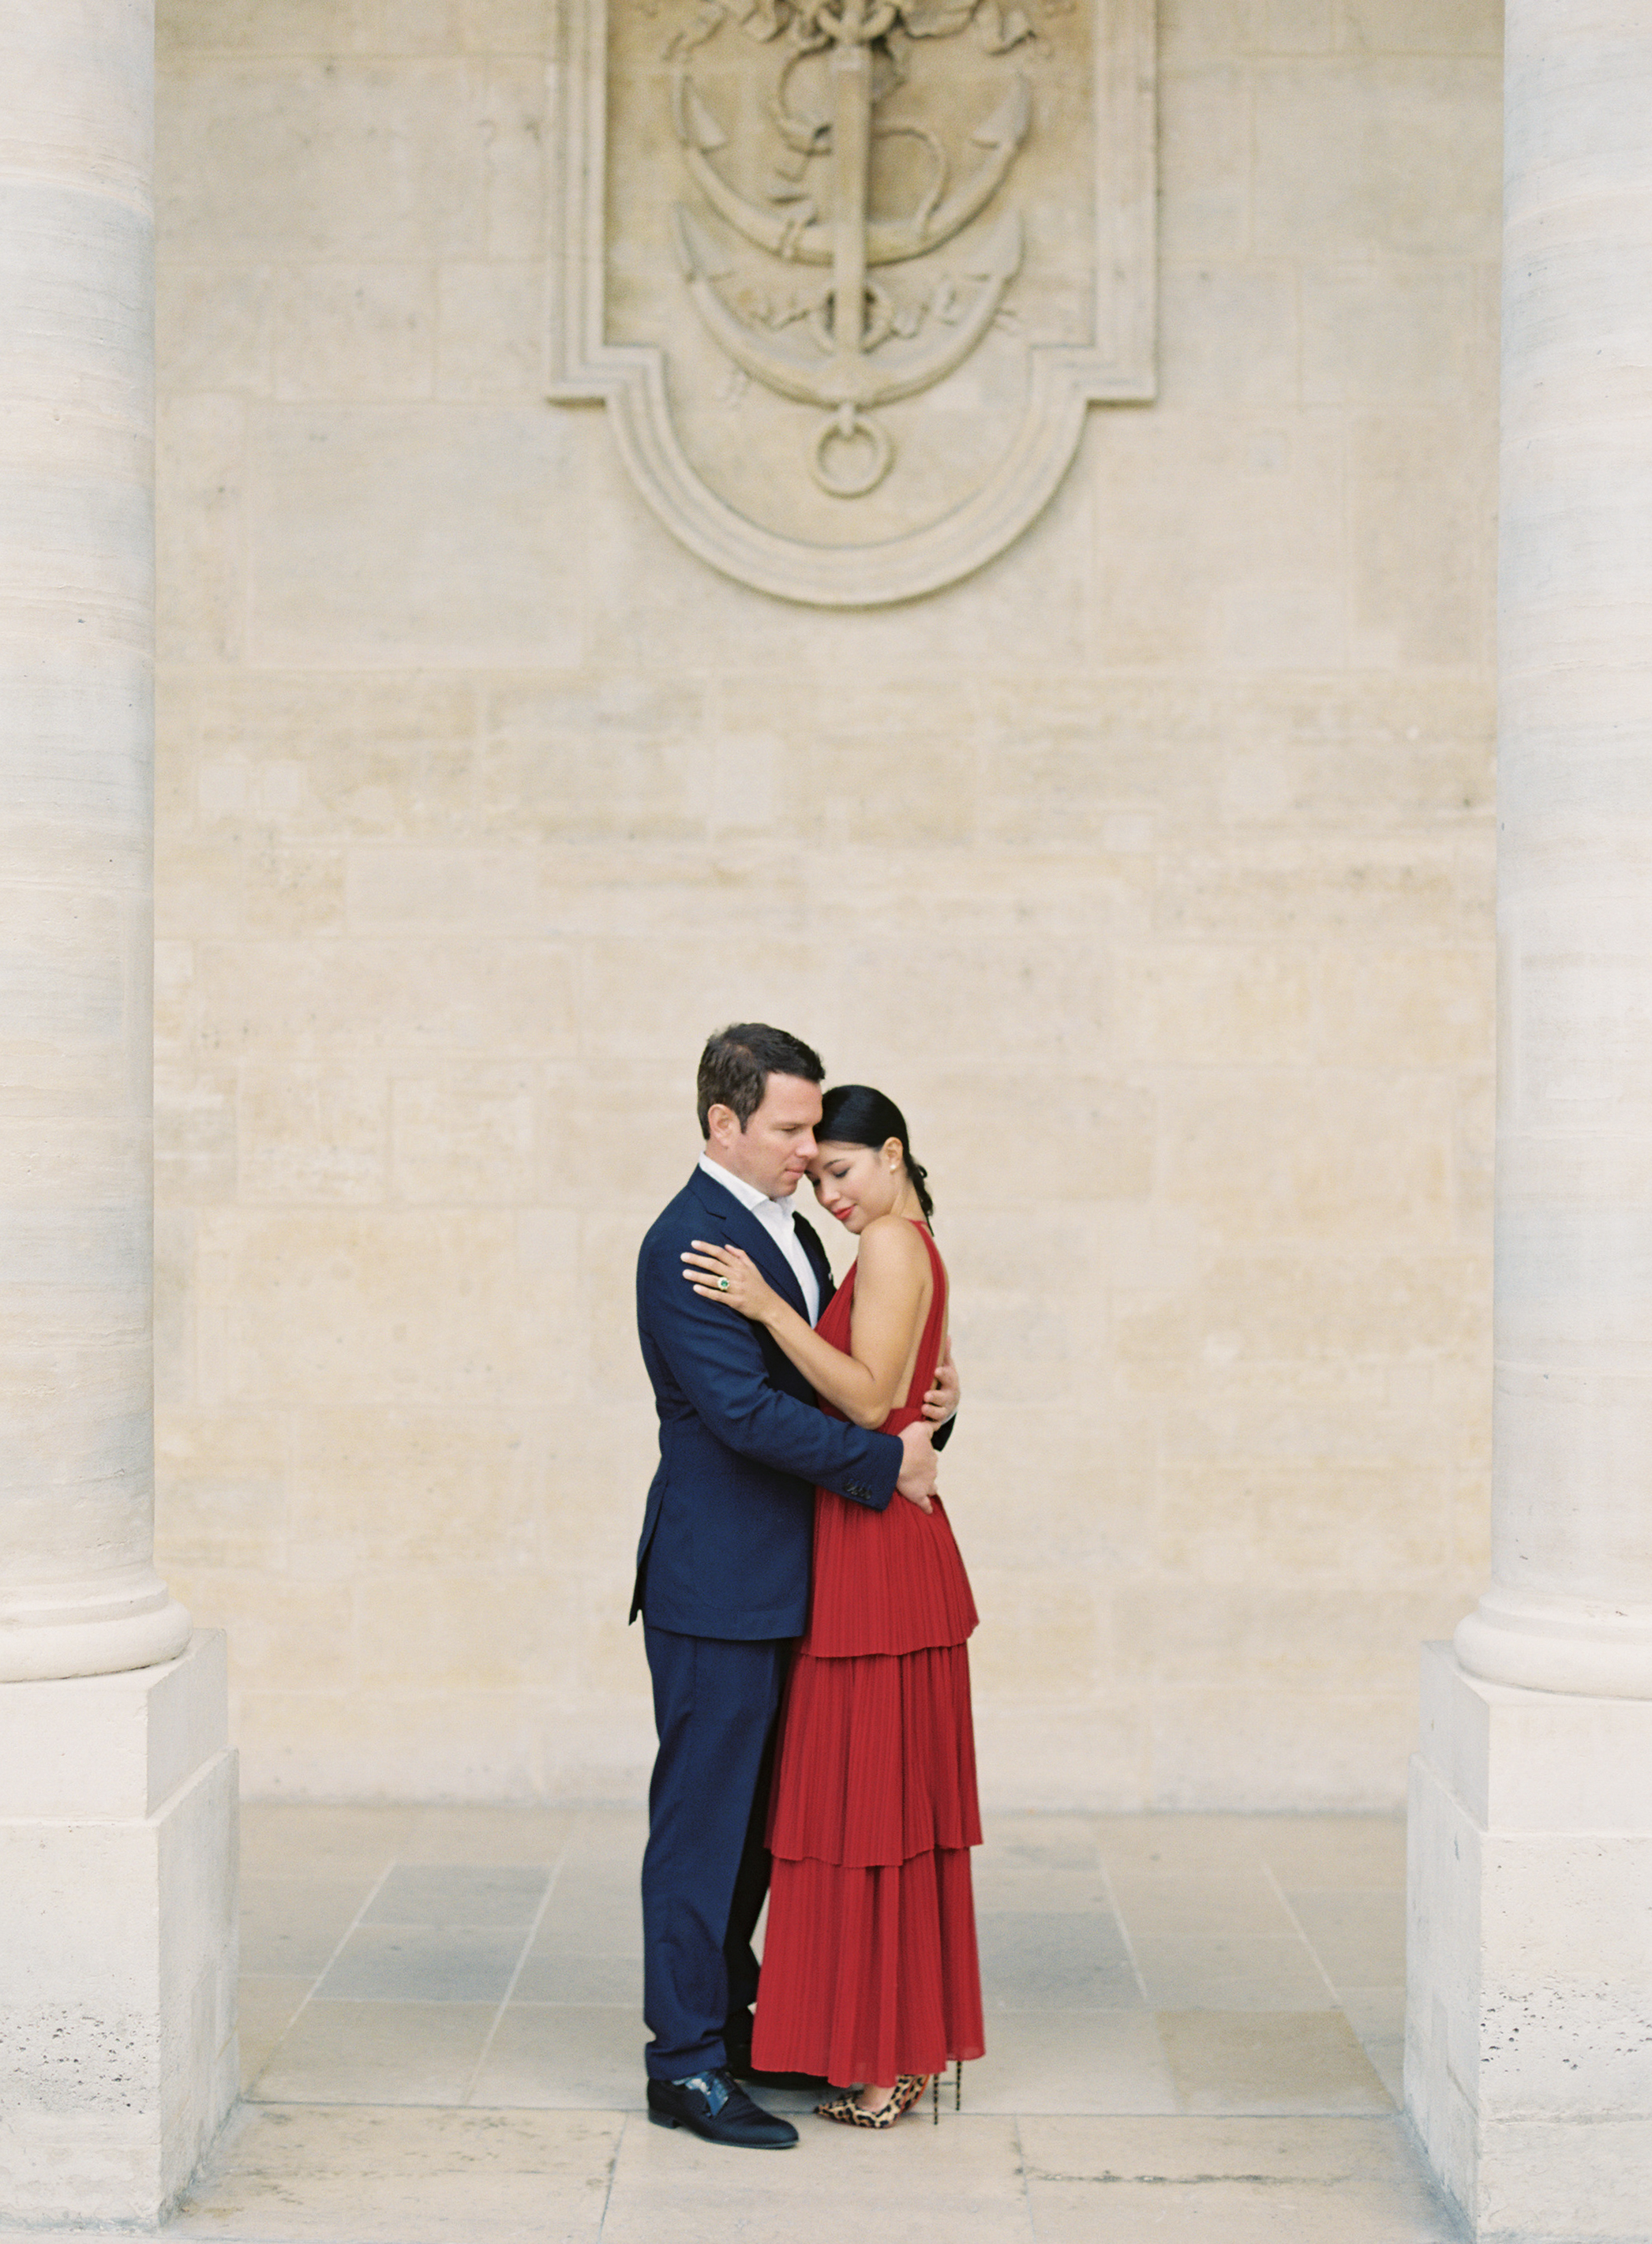 Paris engagement photography-Carrie King Photographer-11.jpg